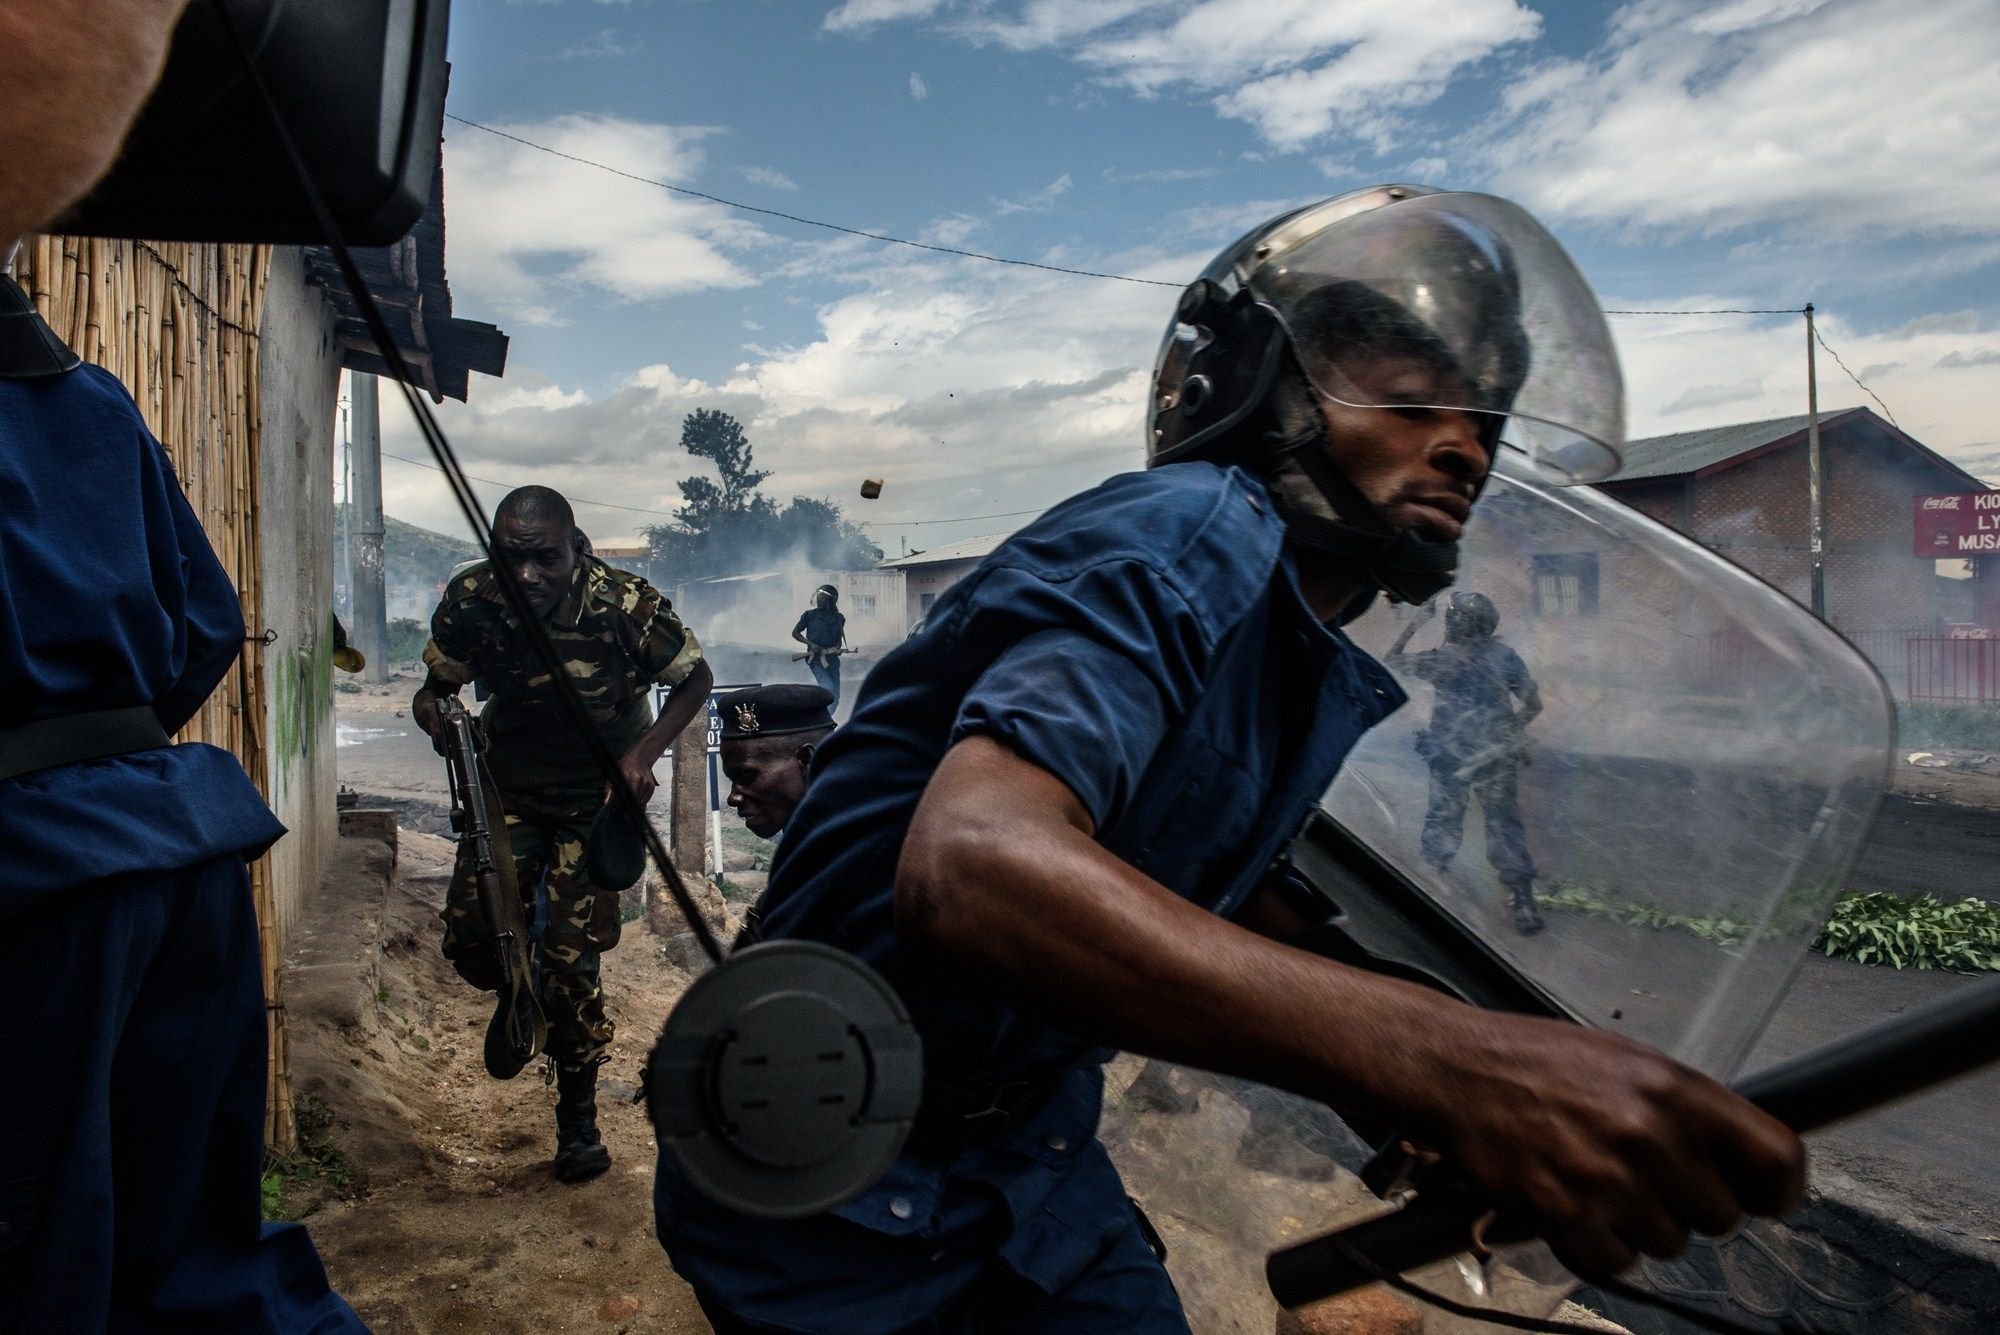 A Burundian police officer runs after protestors in Bujumbura.